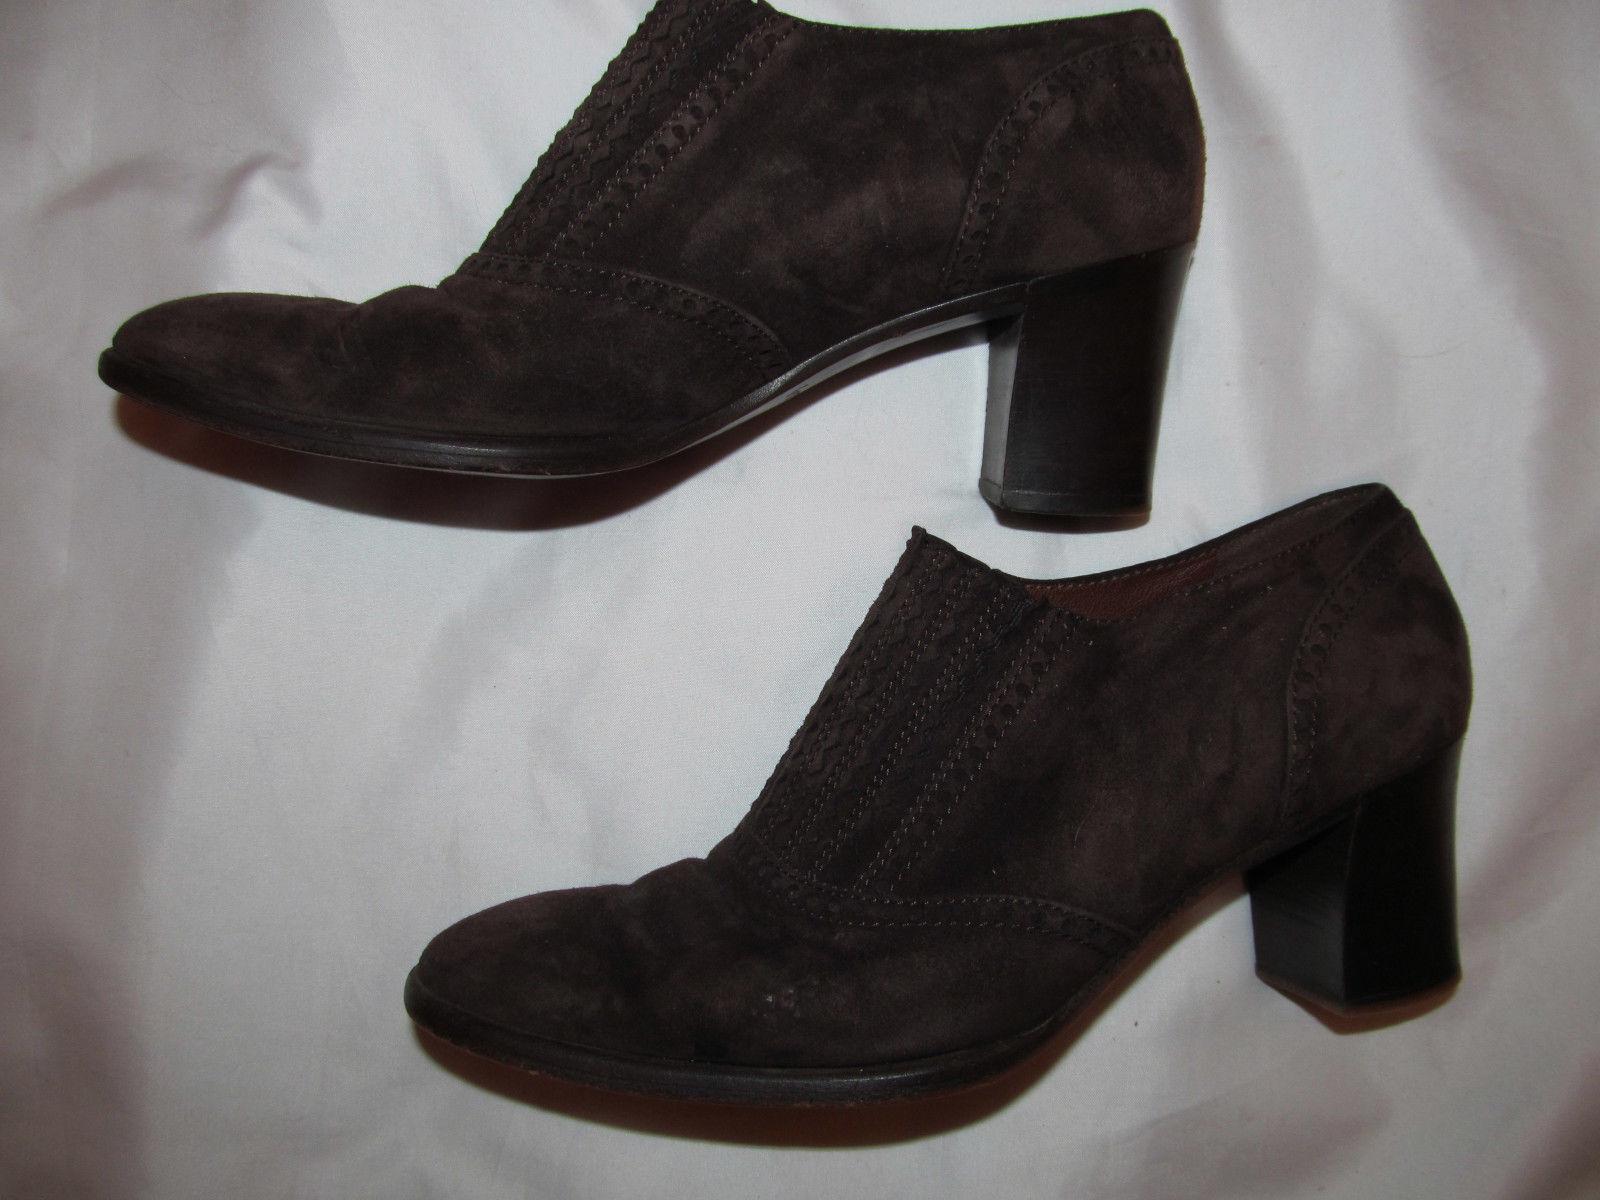 DIEGO DELLA VALLE dark brown suede ankle designer booties shoes 7 ITALY